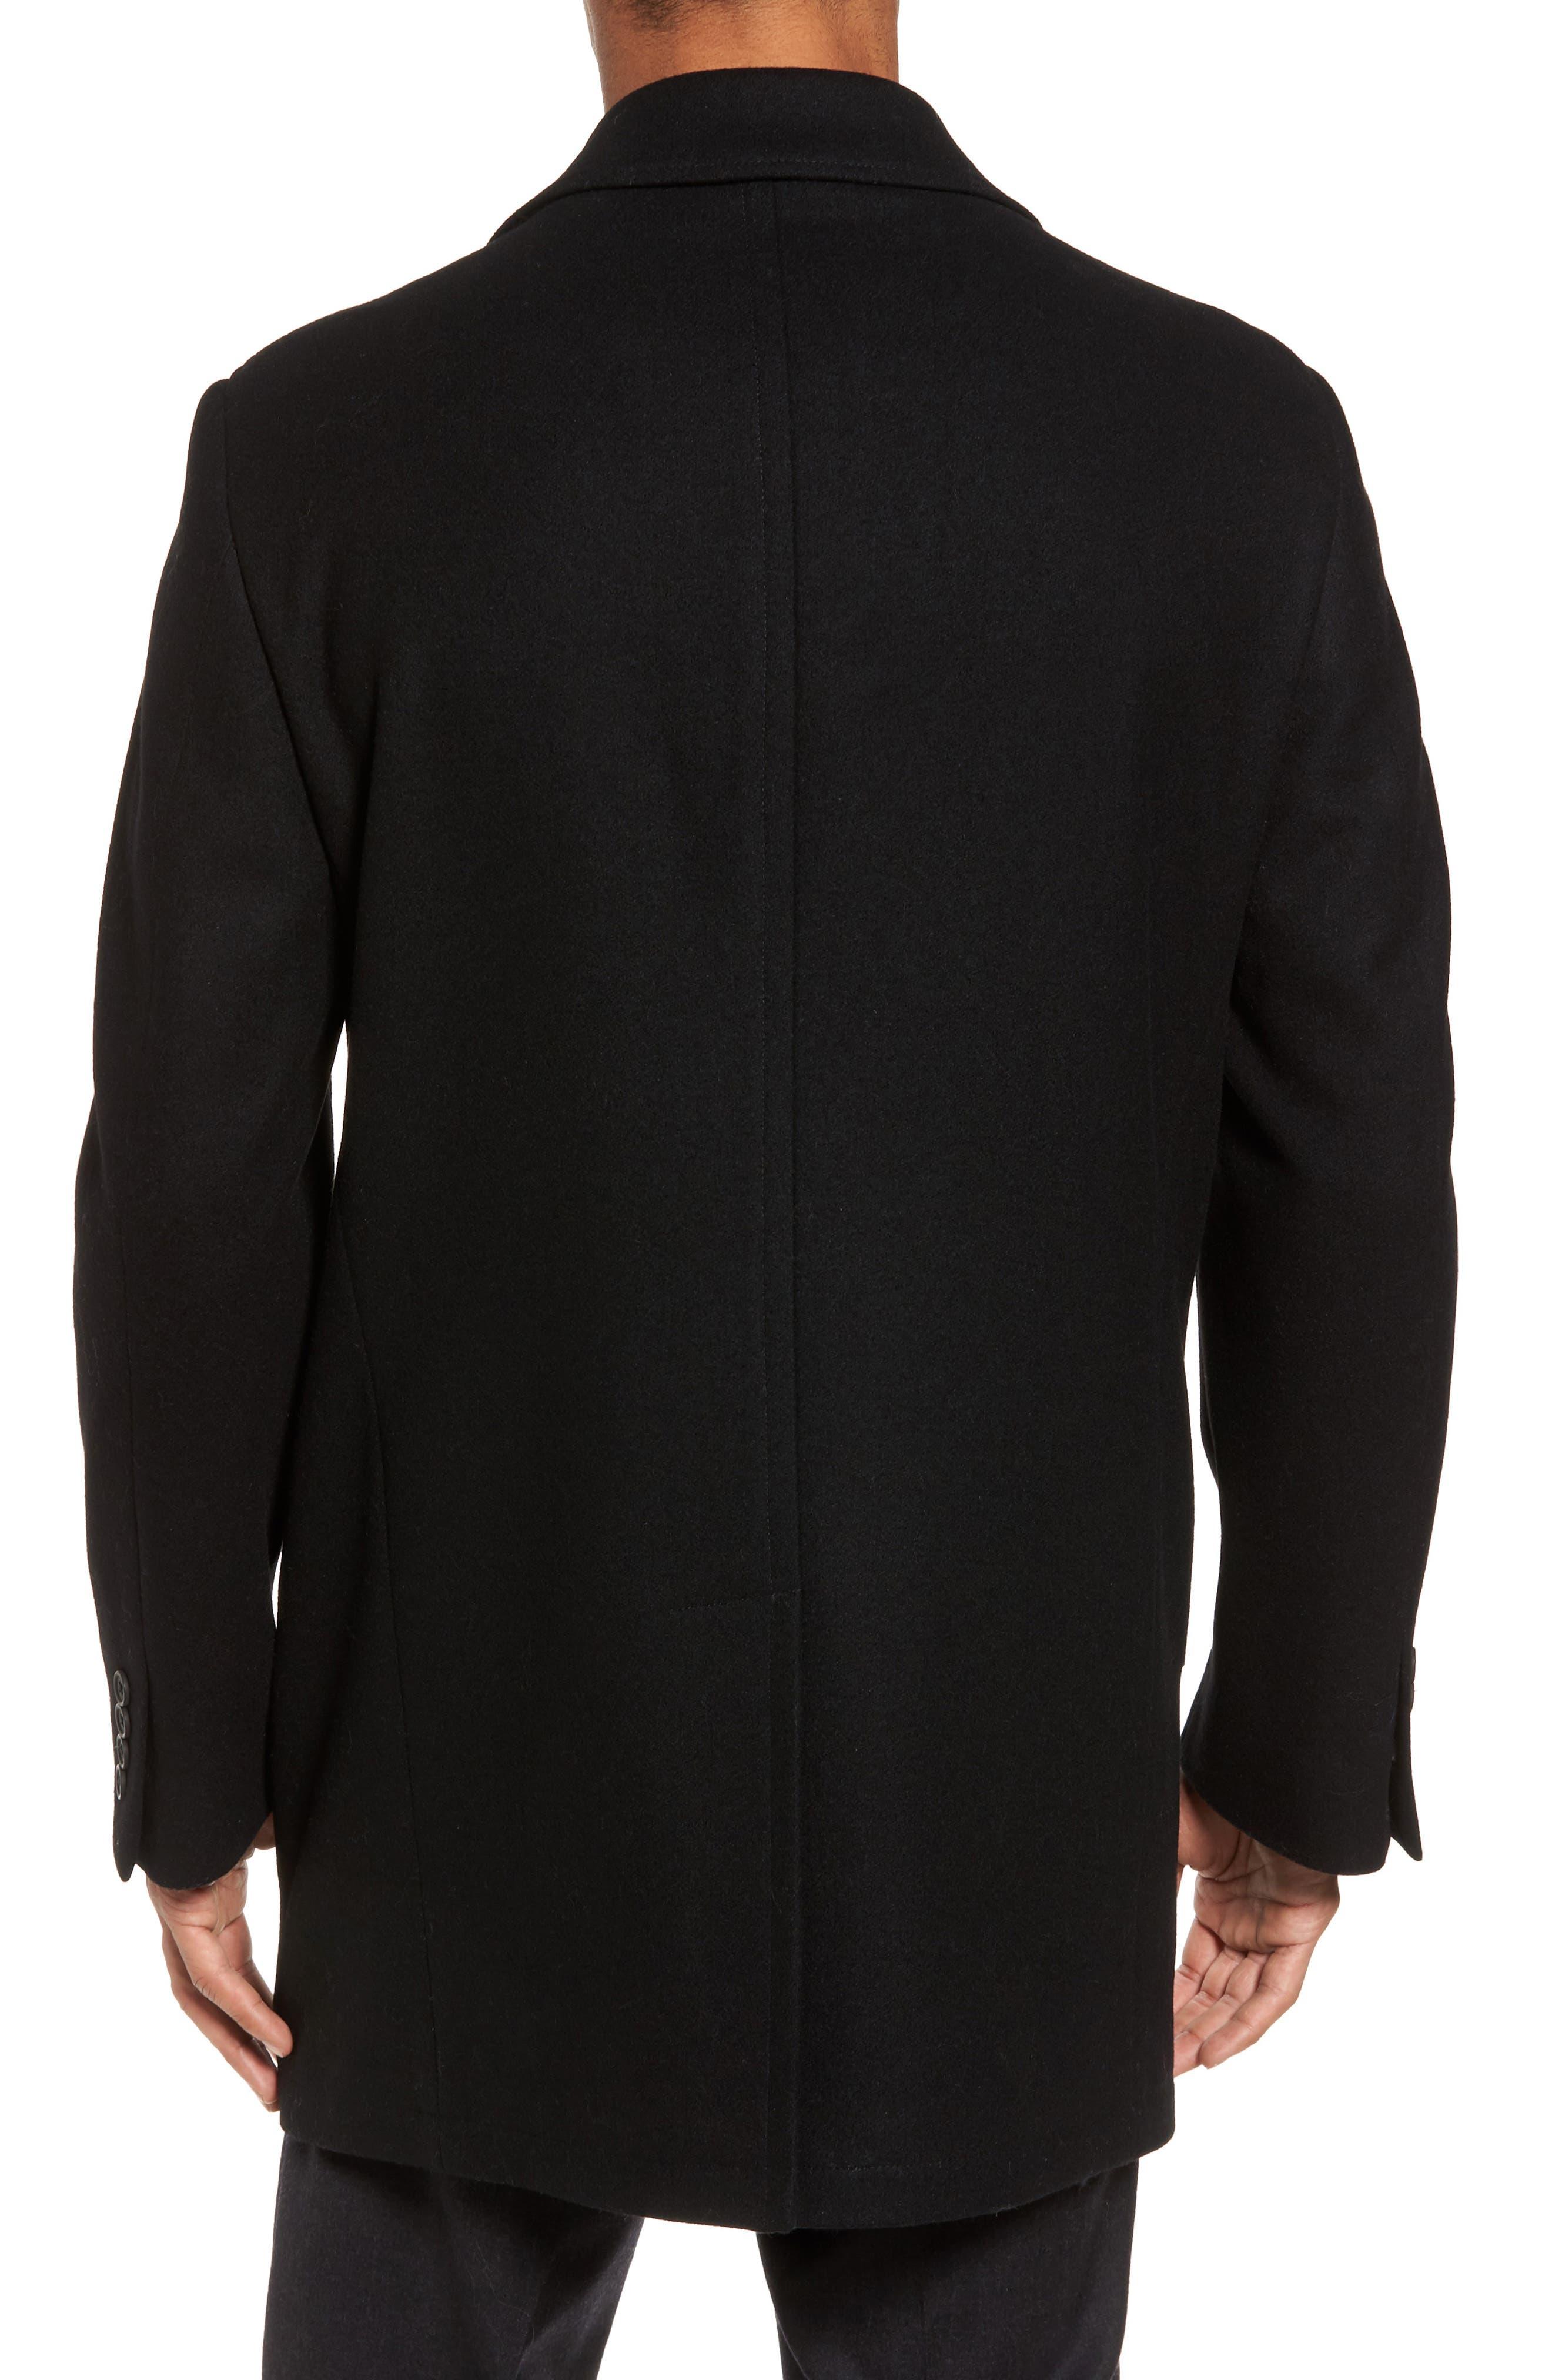 Wool Blend Car Coat,                             Alternate thumbnail 2, color,                             001